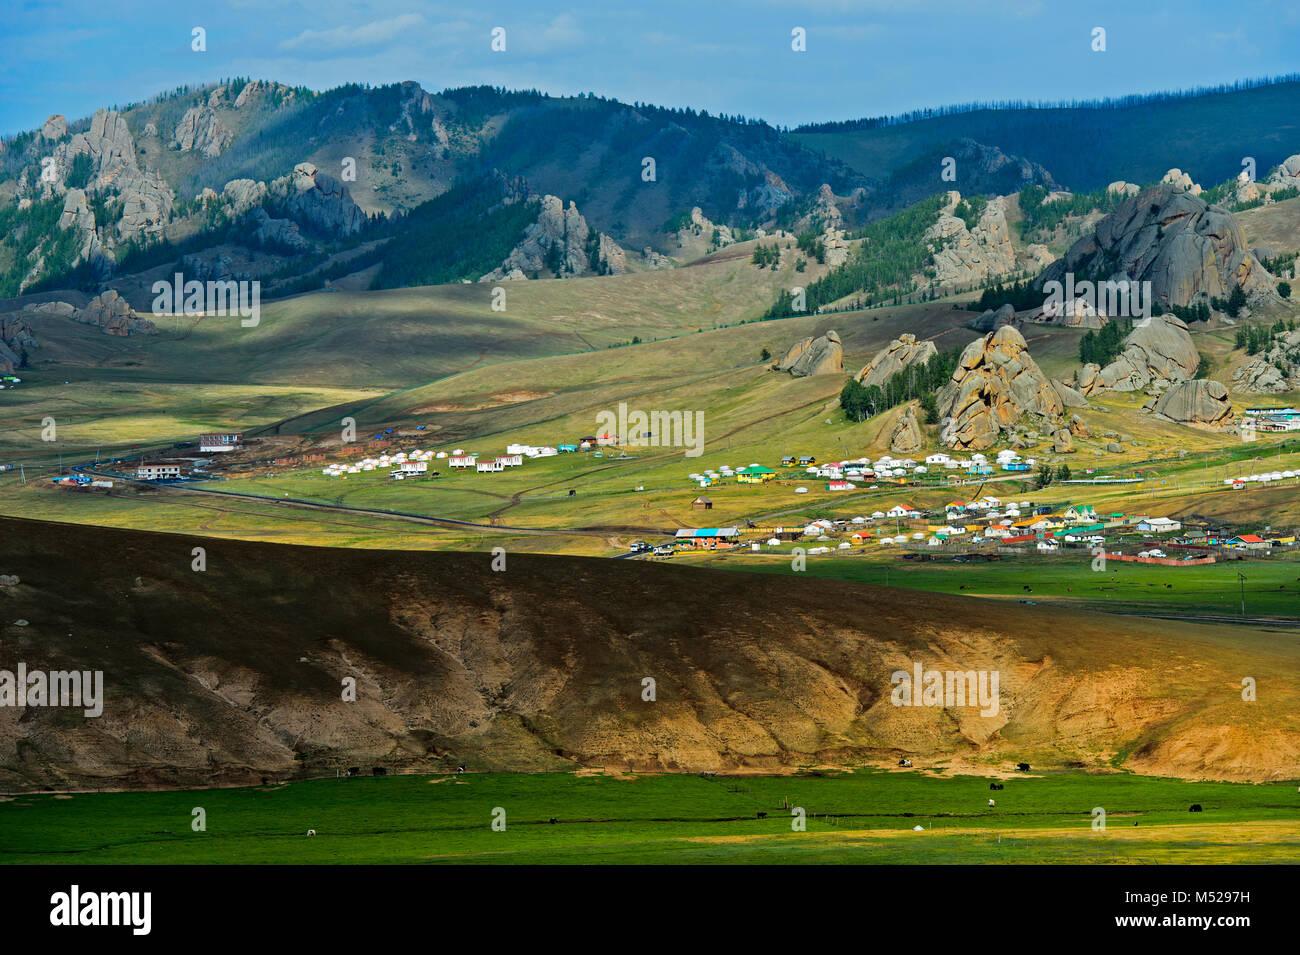 BeniBana Tourist Resort and Bolor Camp Resort in Terelj-Valley,Gorkhi-Terelj National Park,Mongolia - Stock Image